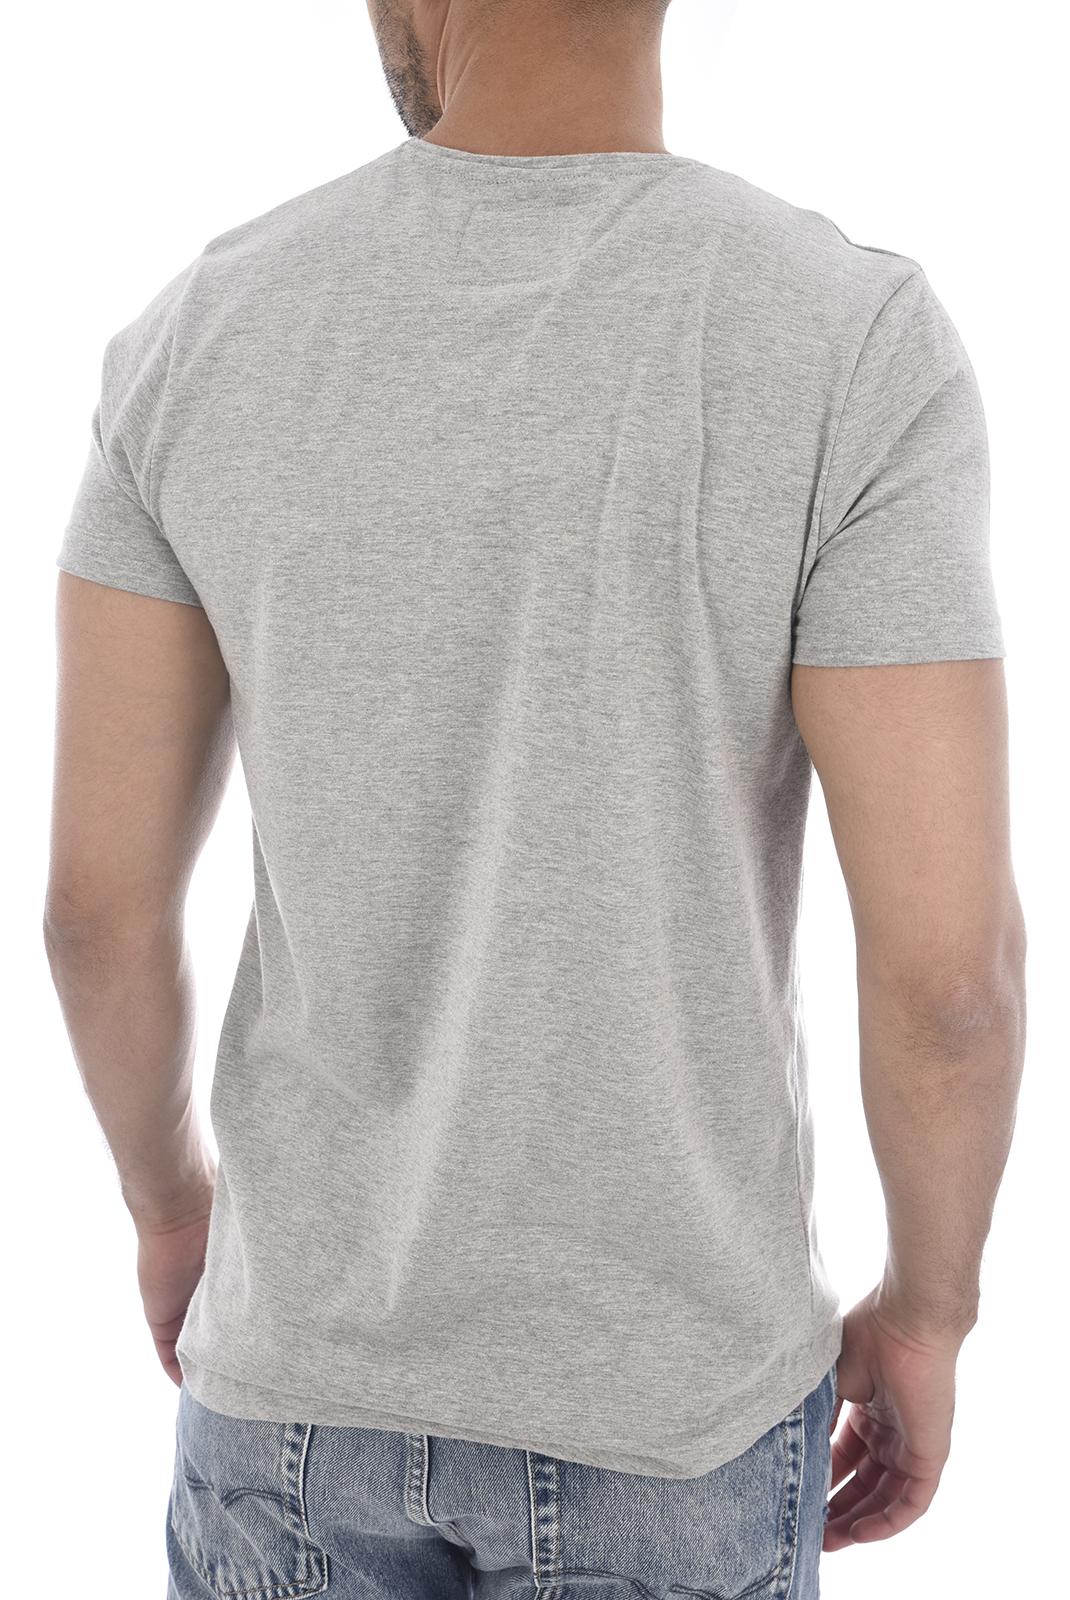 Tee-shirts  Hite couture MATER LT GREY MEL